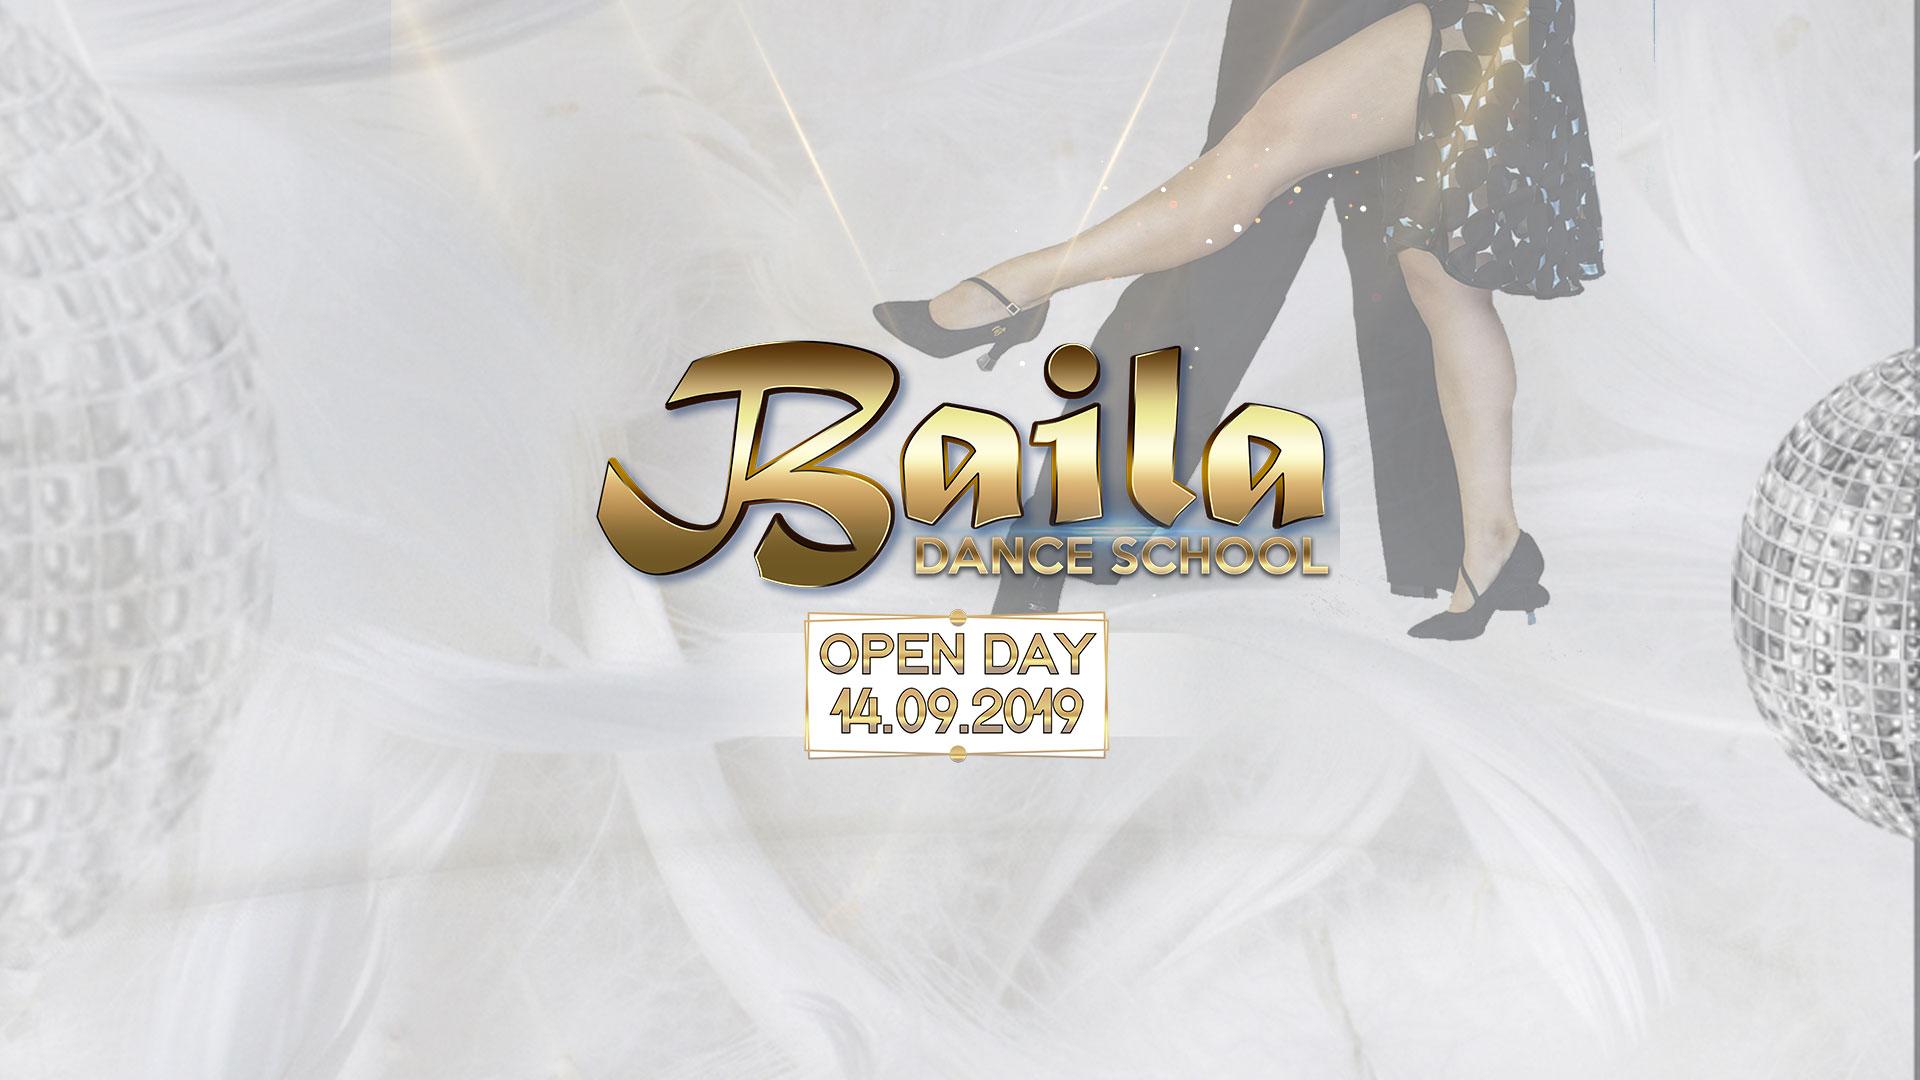 baila dance school spoleto